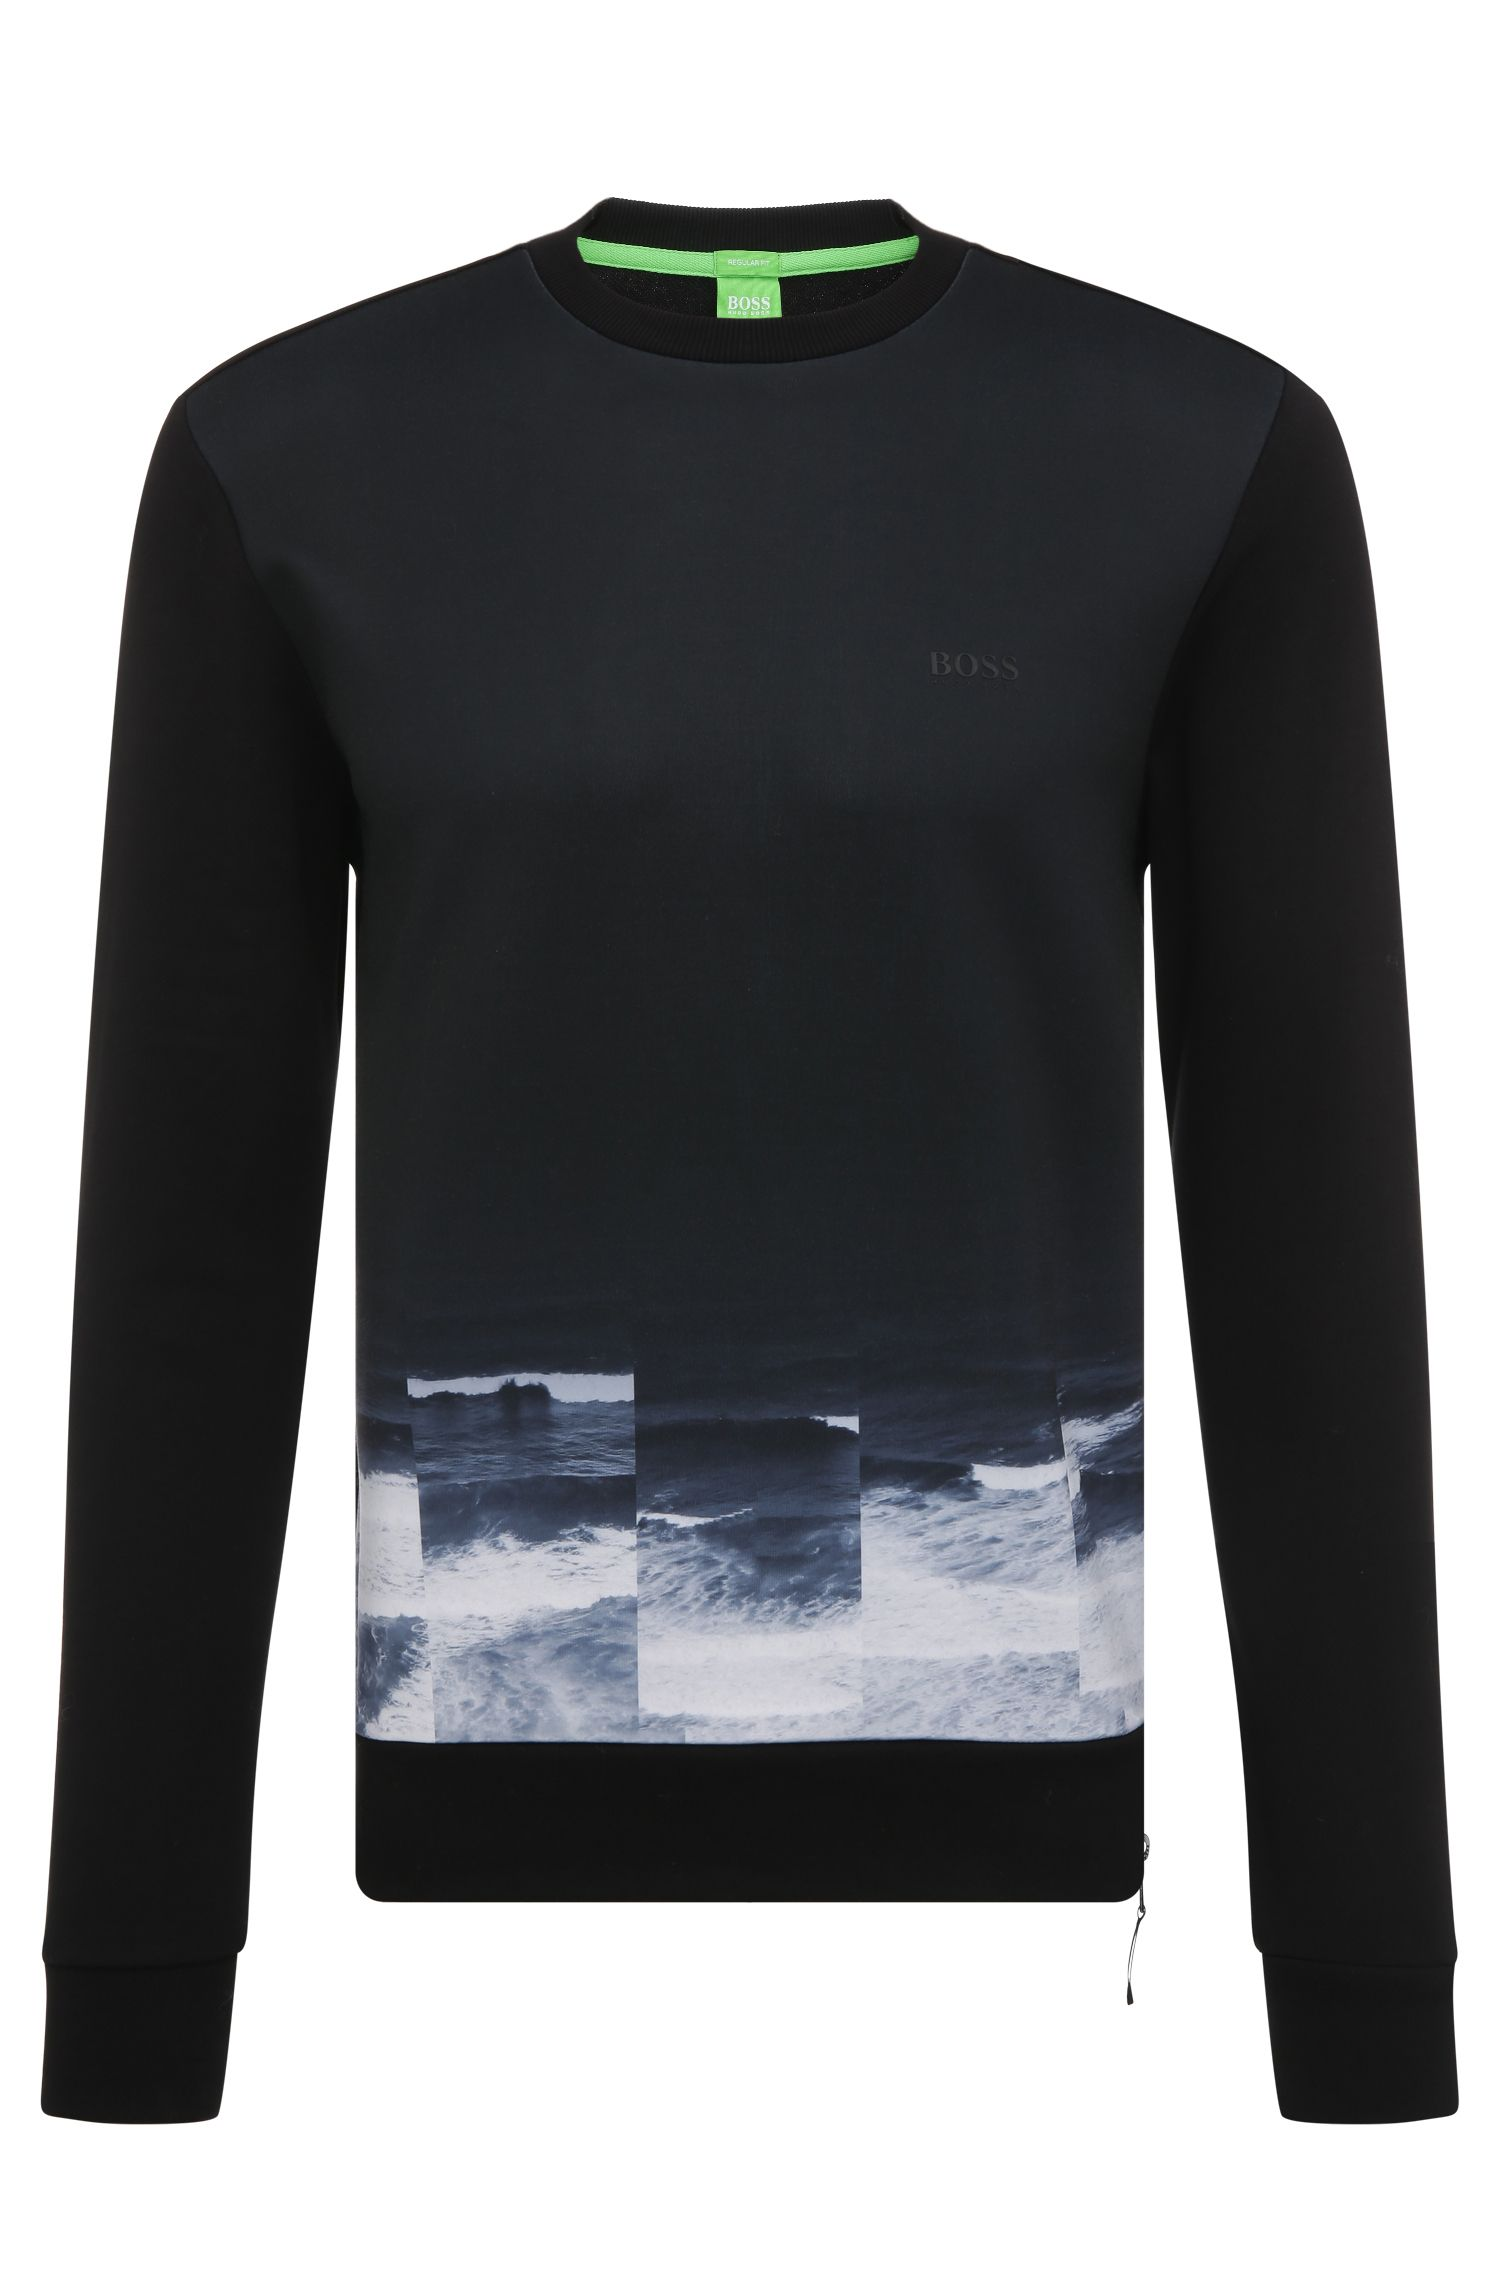 Cotton Printed Sweatshirt | Salbon